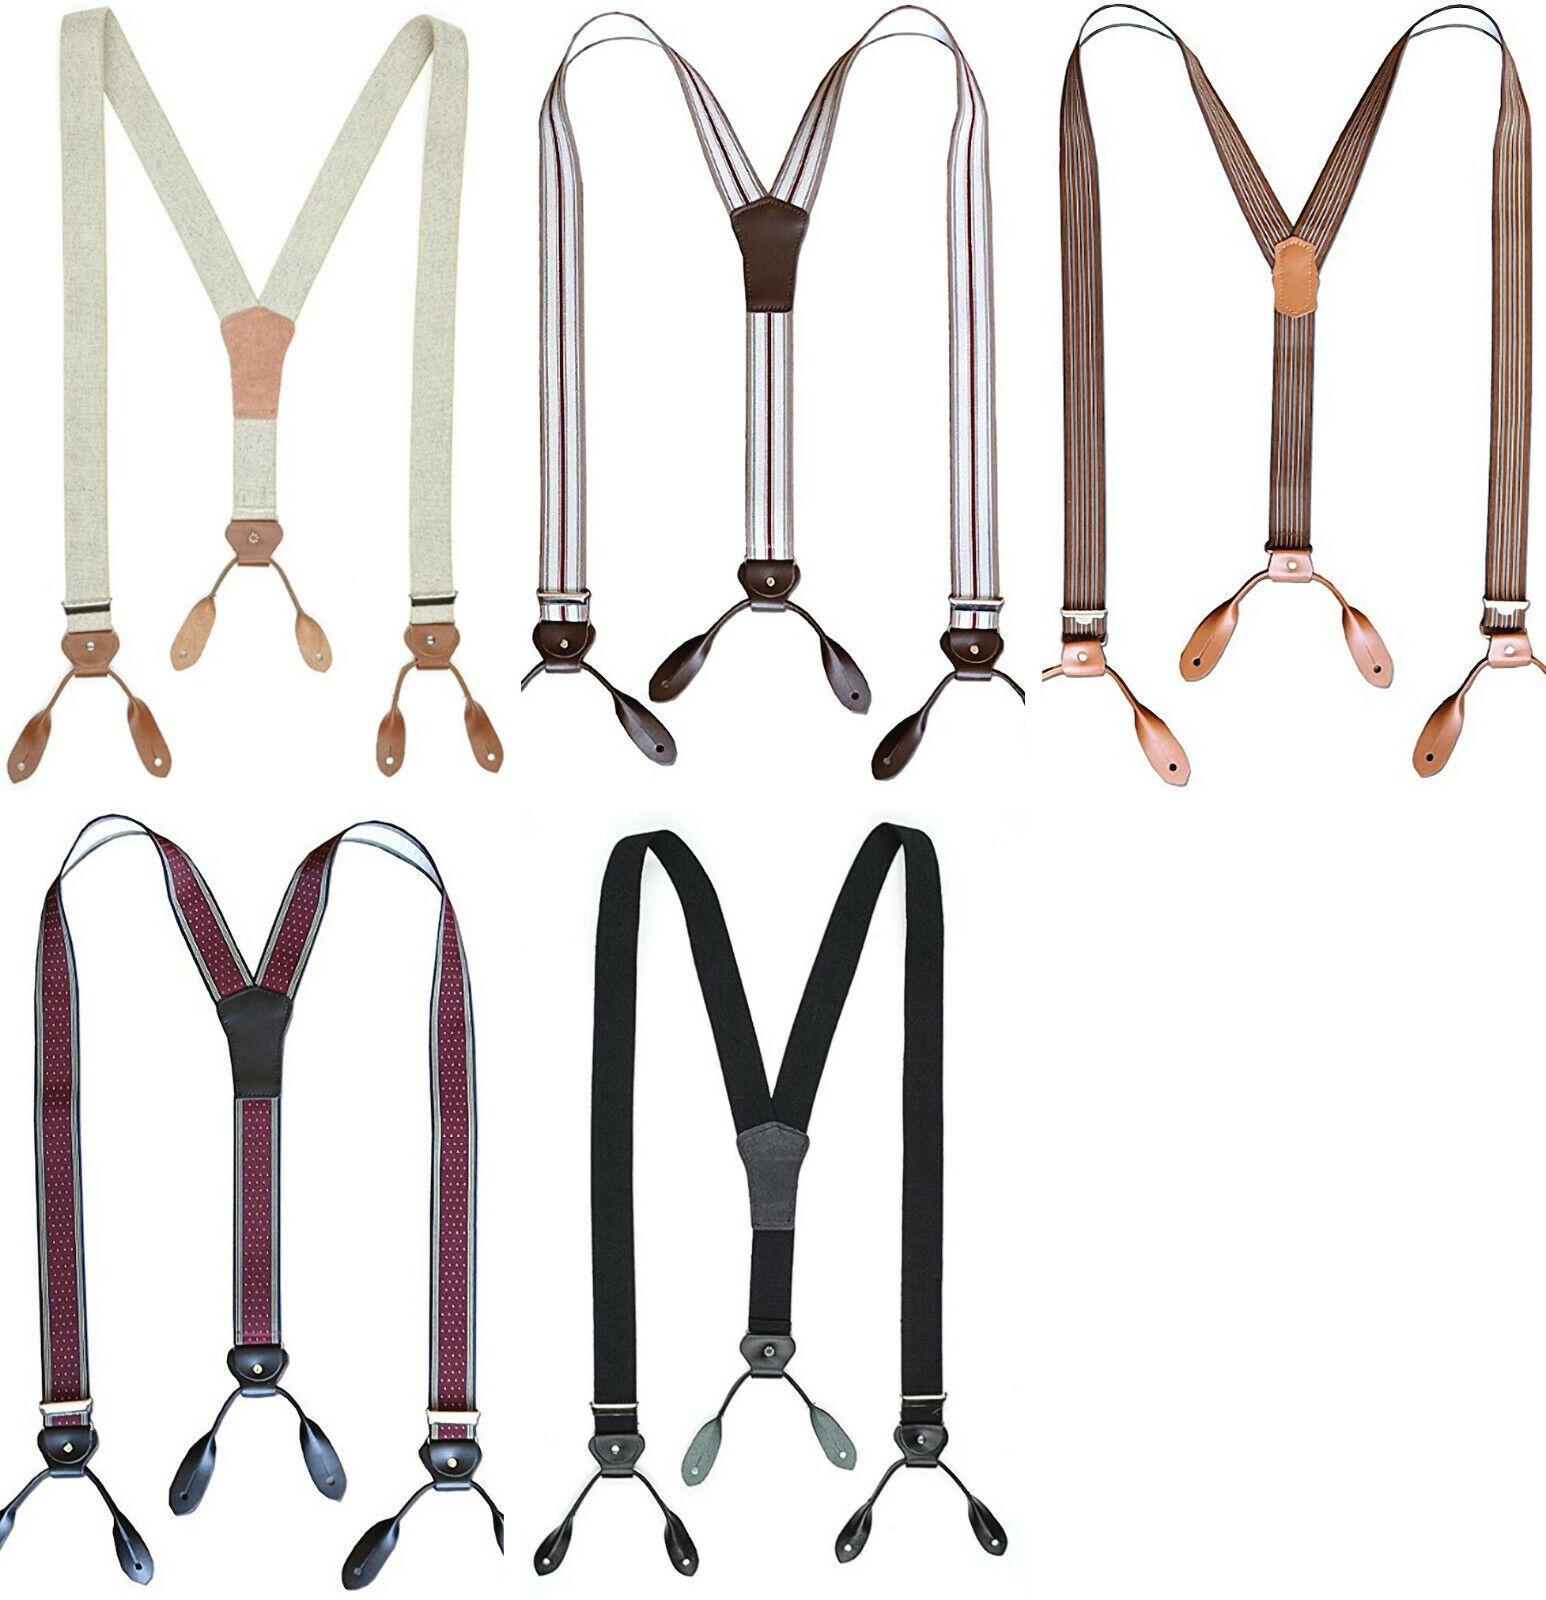 Stars & Stripes Oldstyle Hosenträger Hose Lederlaschen Anknöpfen